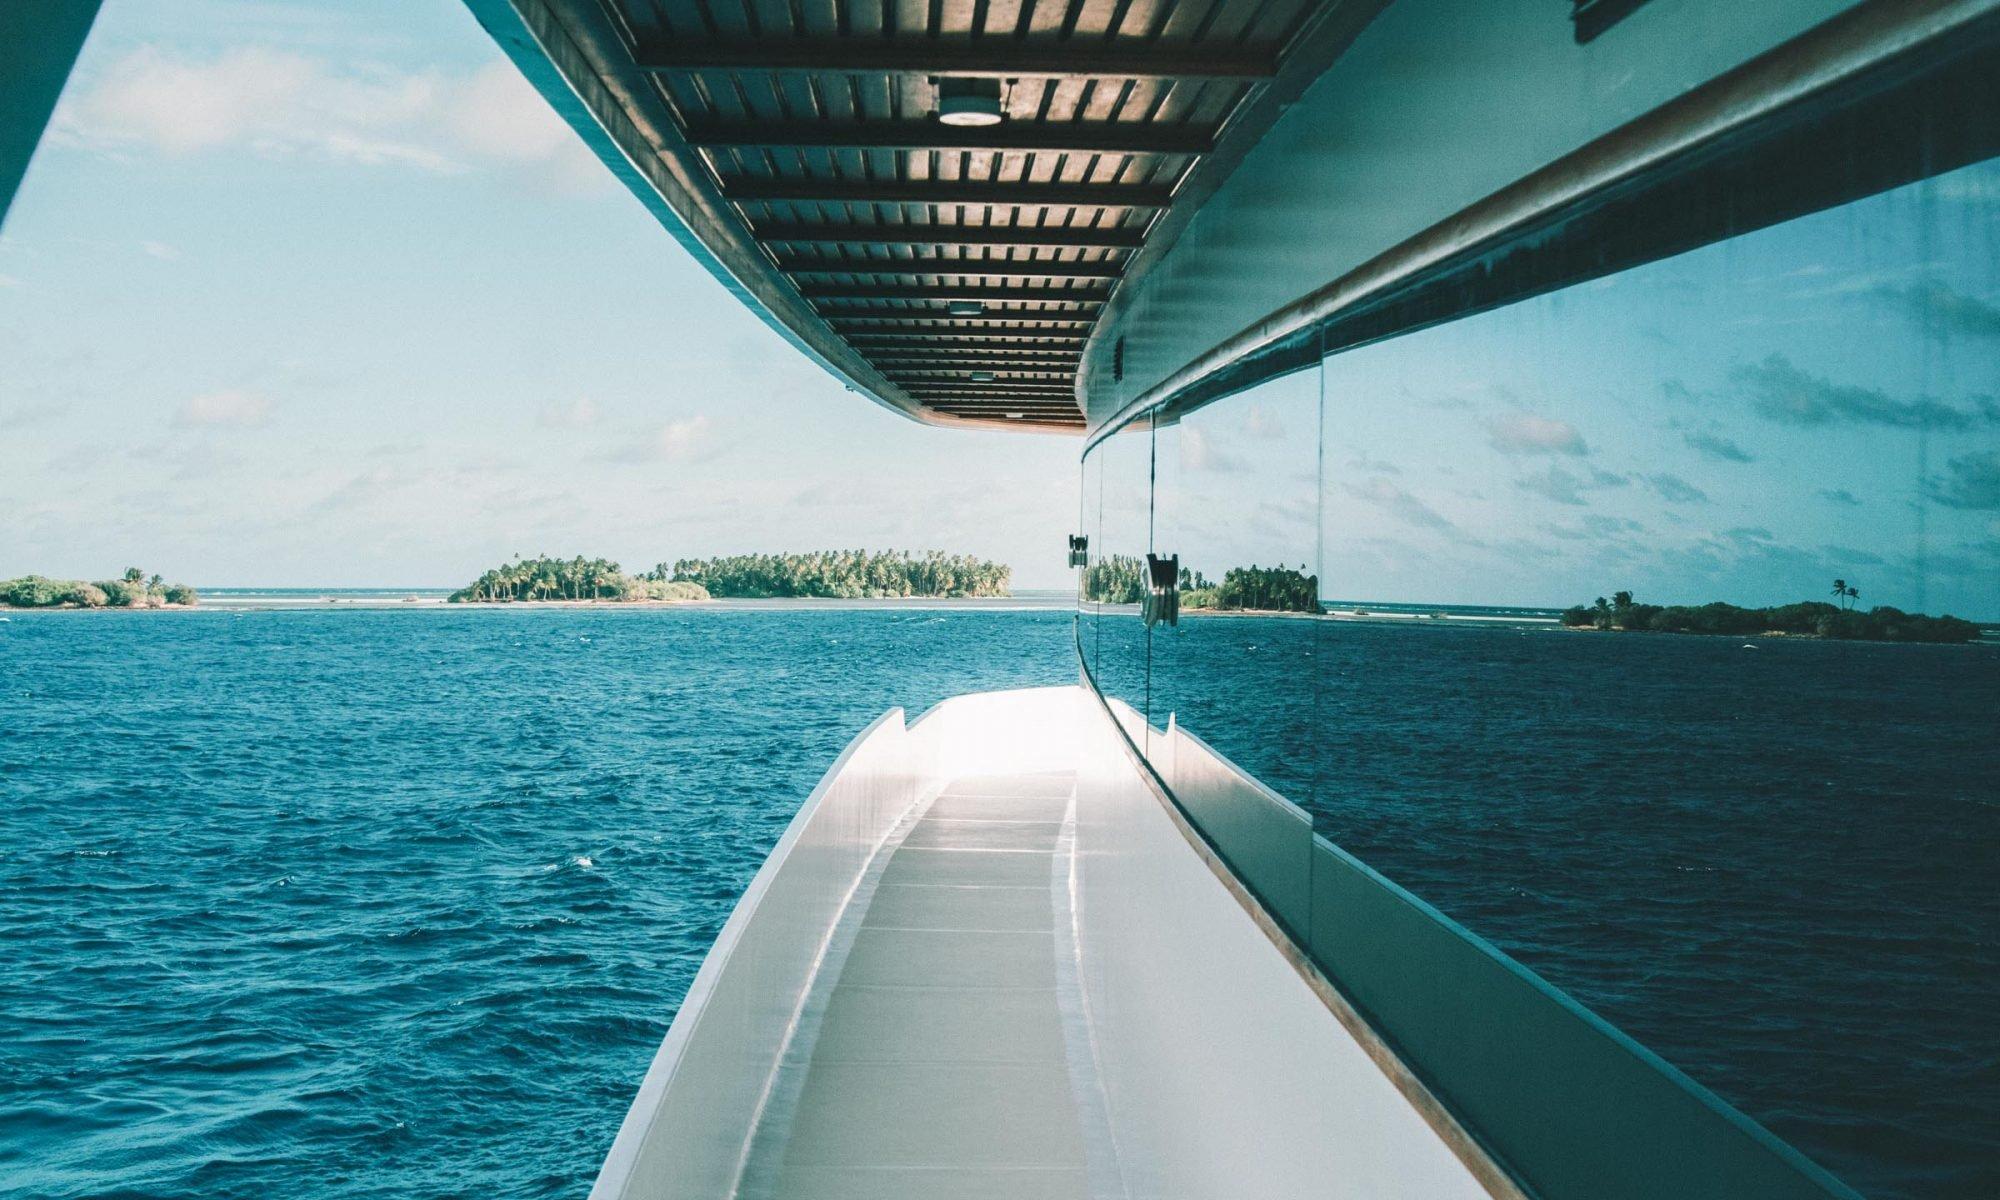 Surf boat Southern Atoll